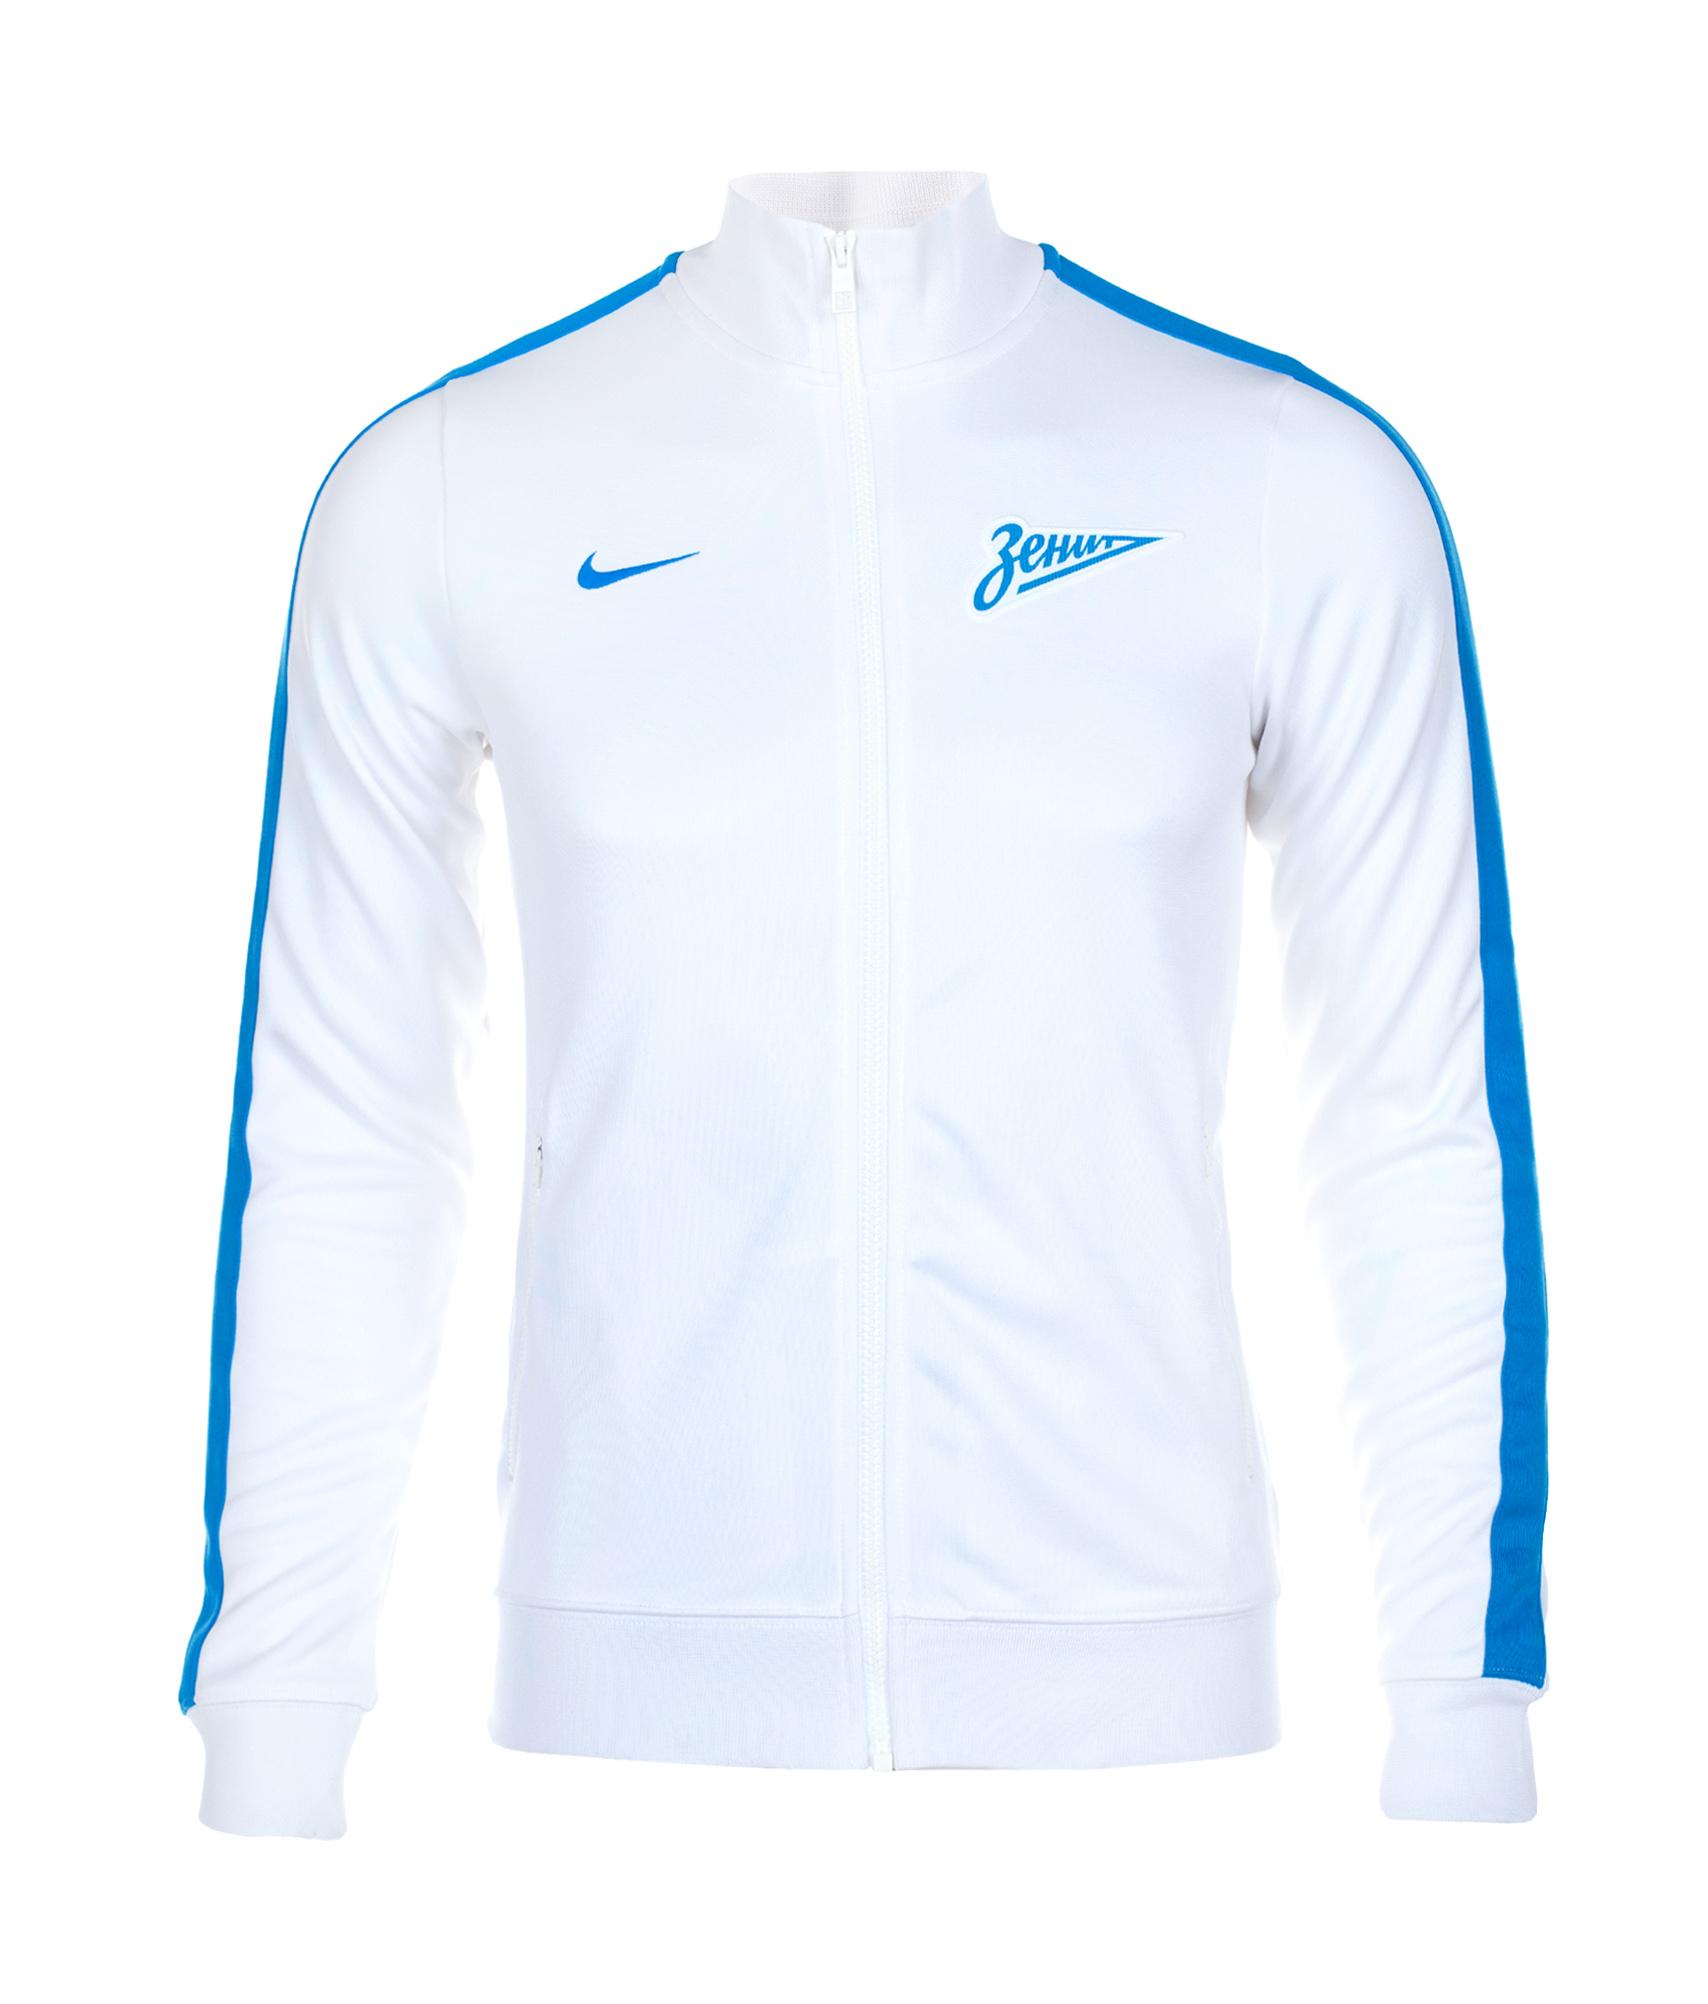 Белая олимпийка Nike, Цвет-Белый, Размер-S